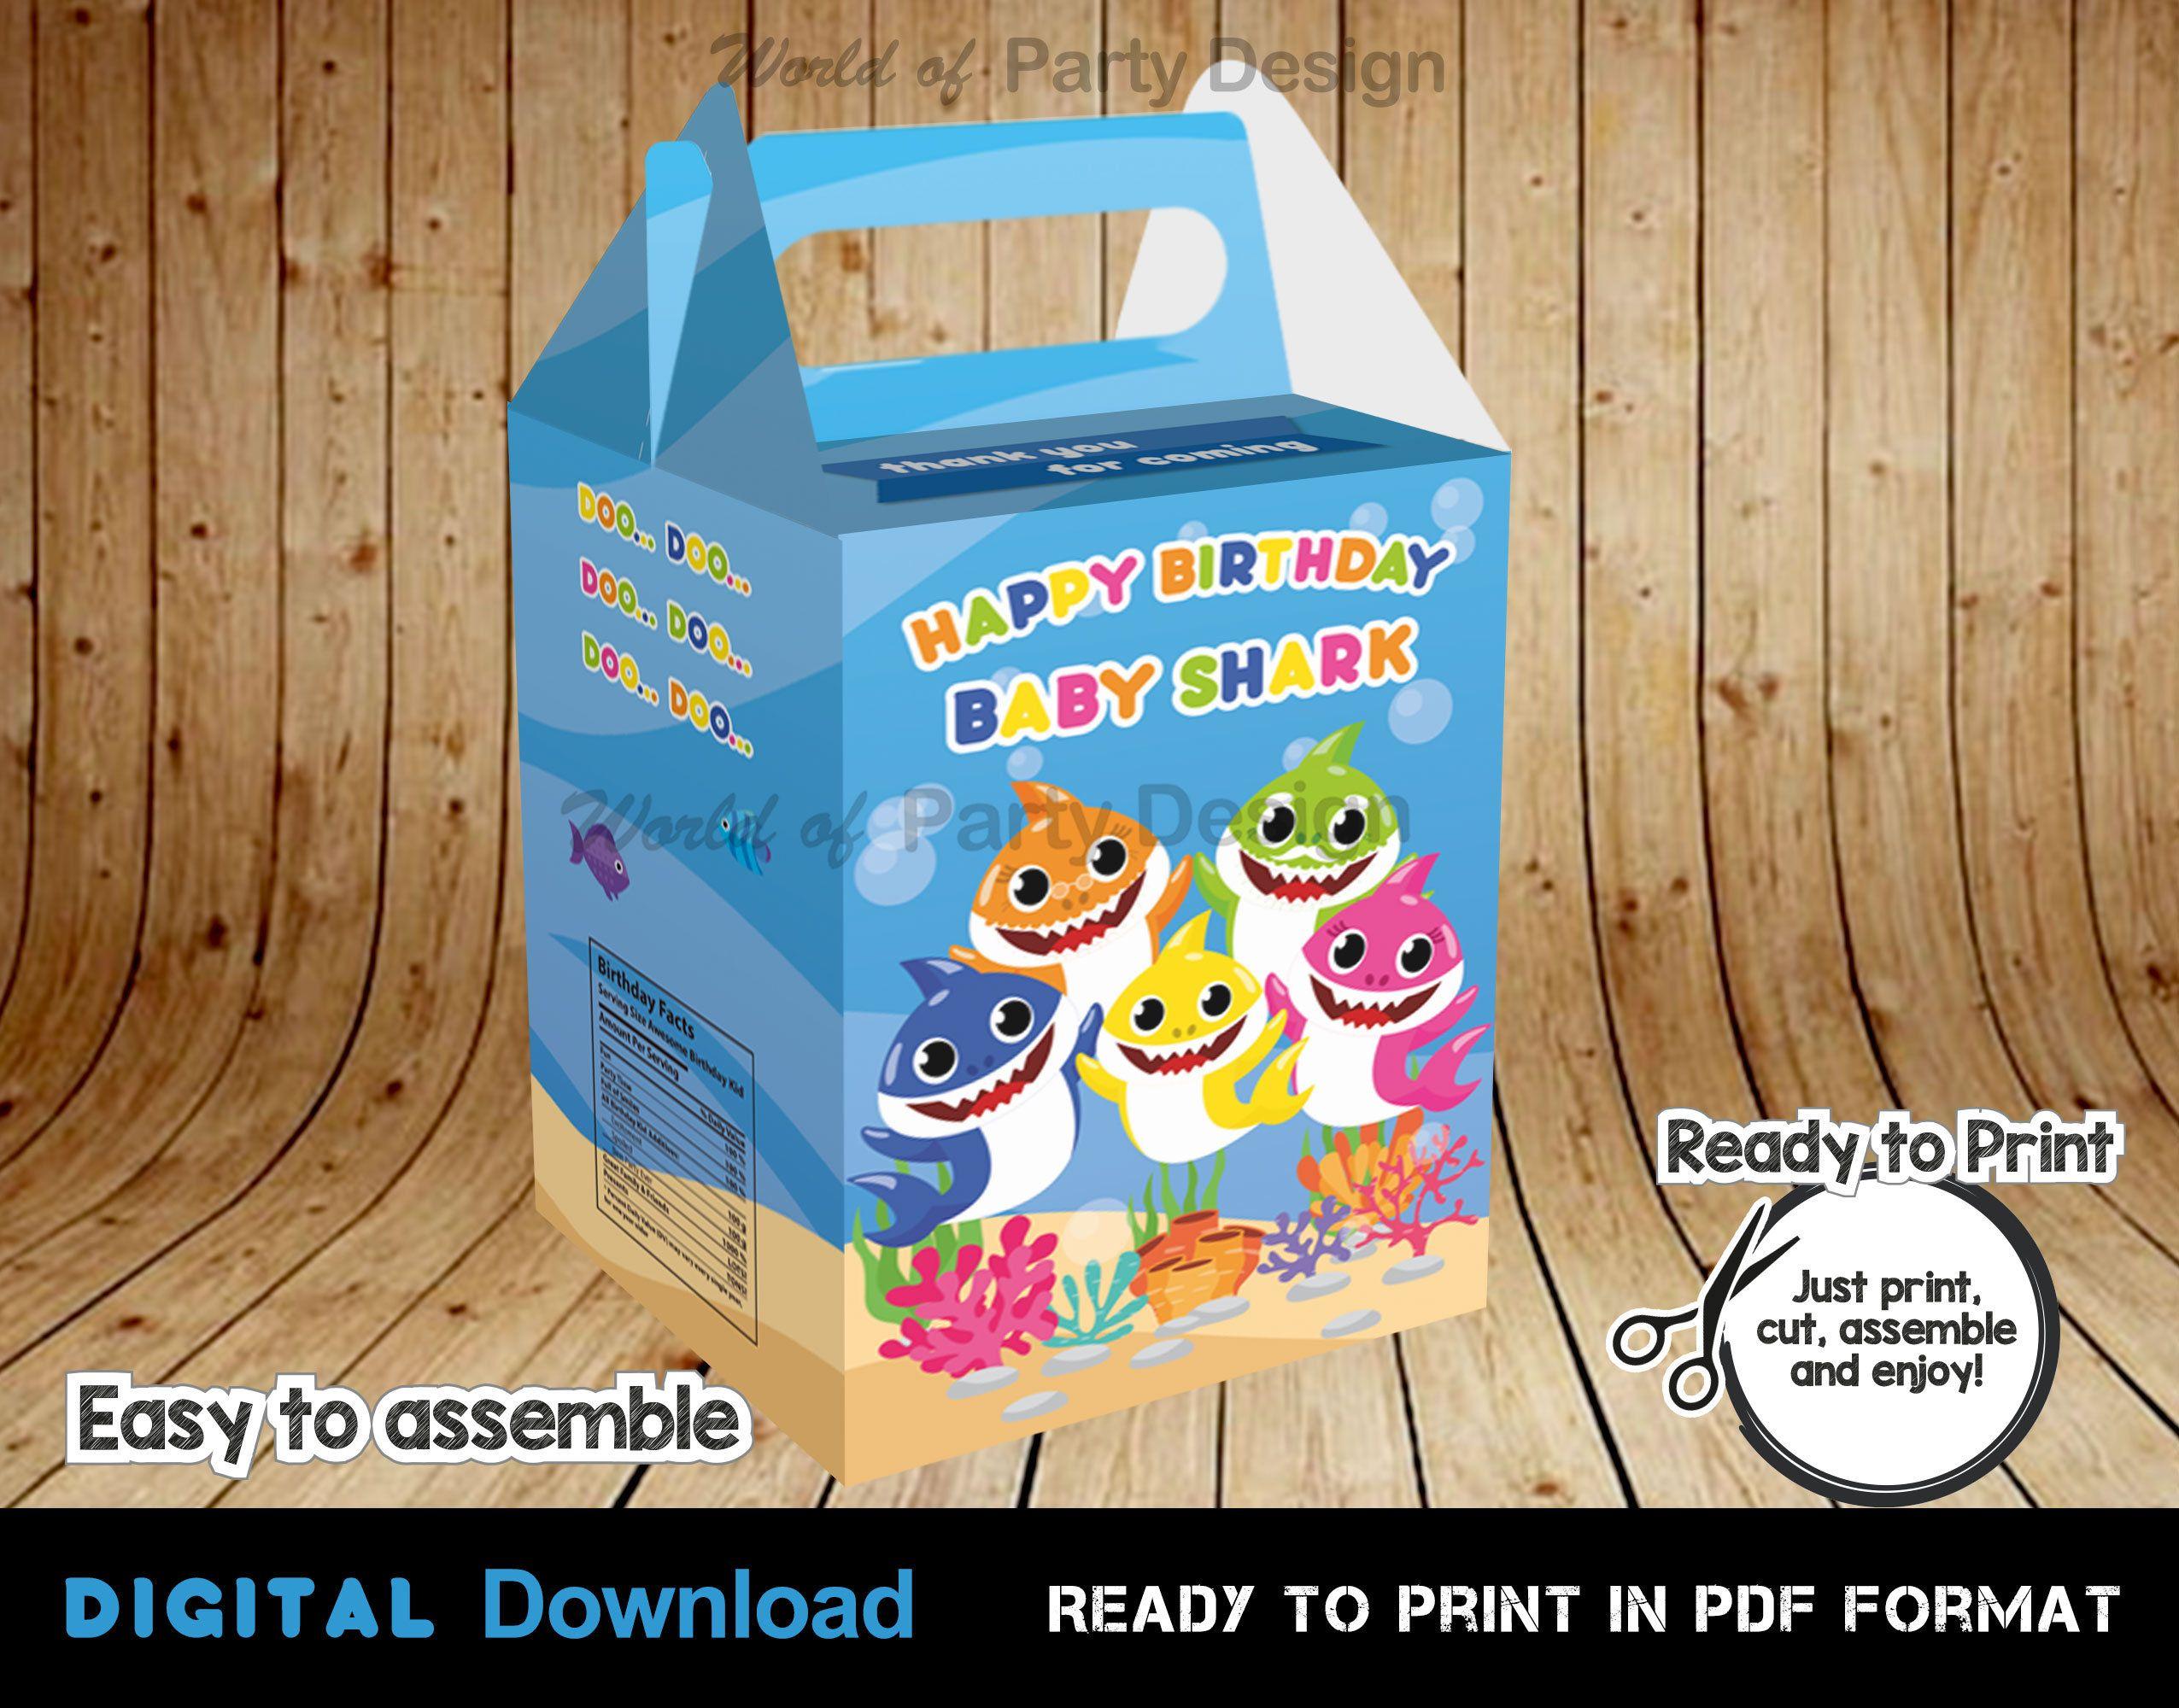 Baby Shark Gable Box, Birthday decorations, Sea Theme Gift, Party Favors, Launch Box Present